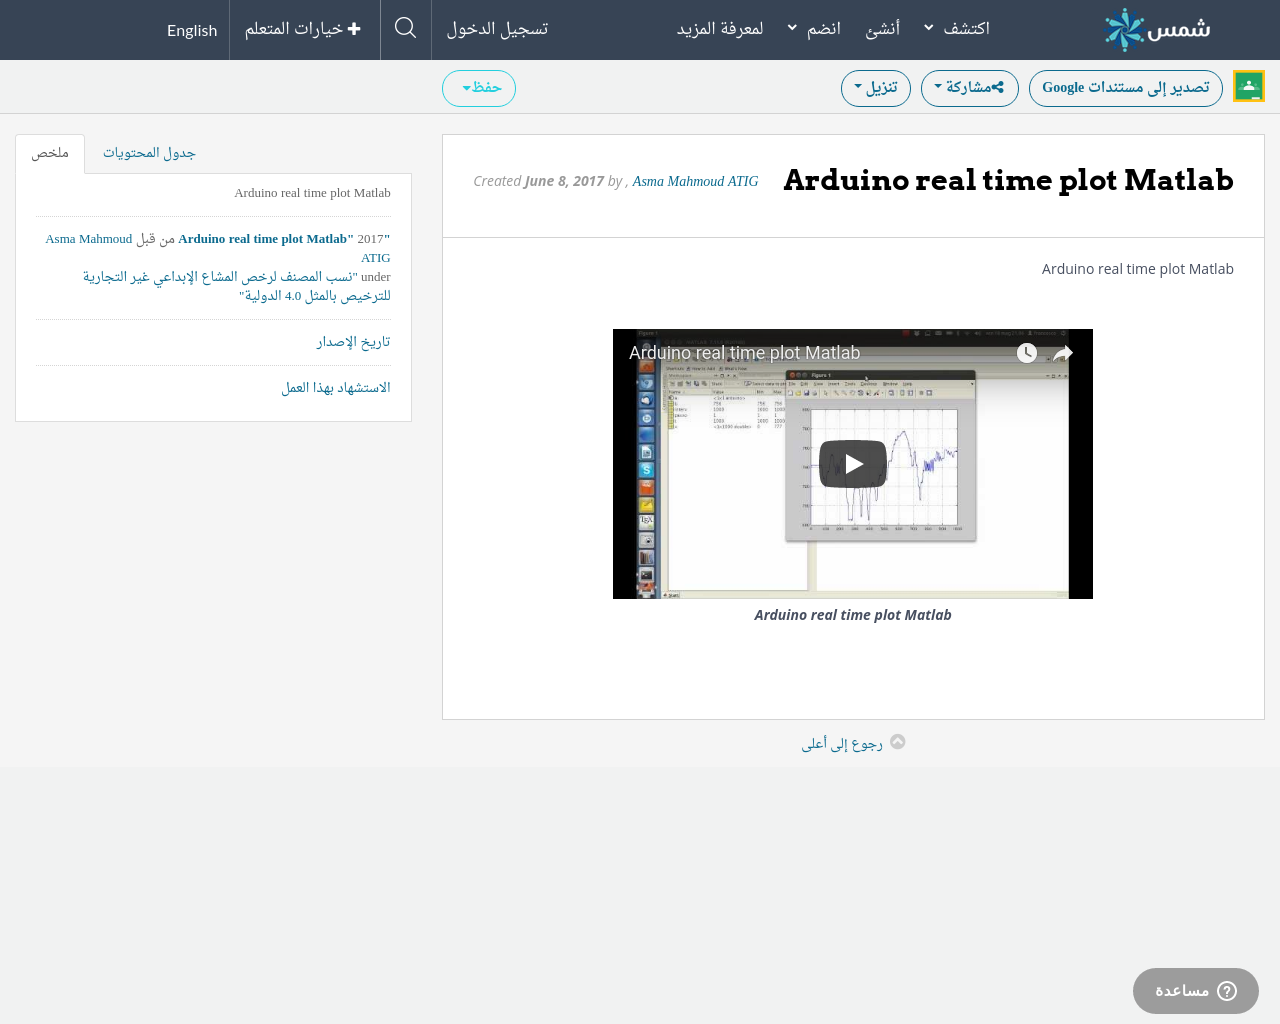 Arduino real time plot Matlab | SHMS - Saudi OER Network